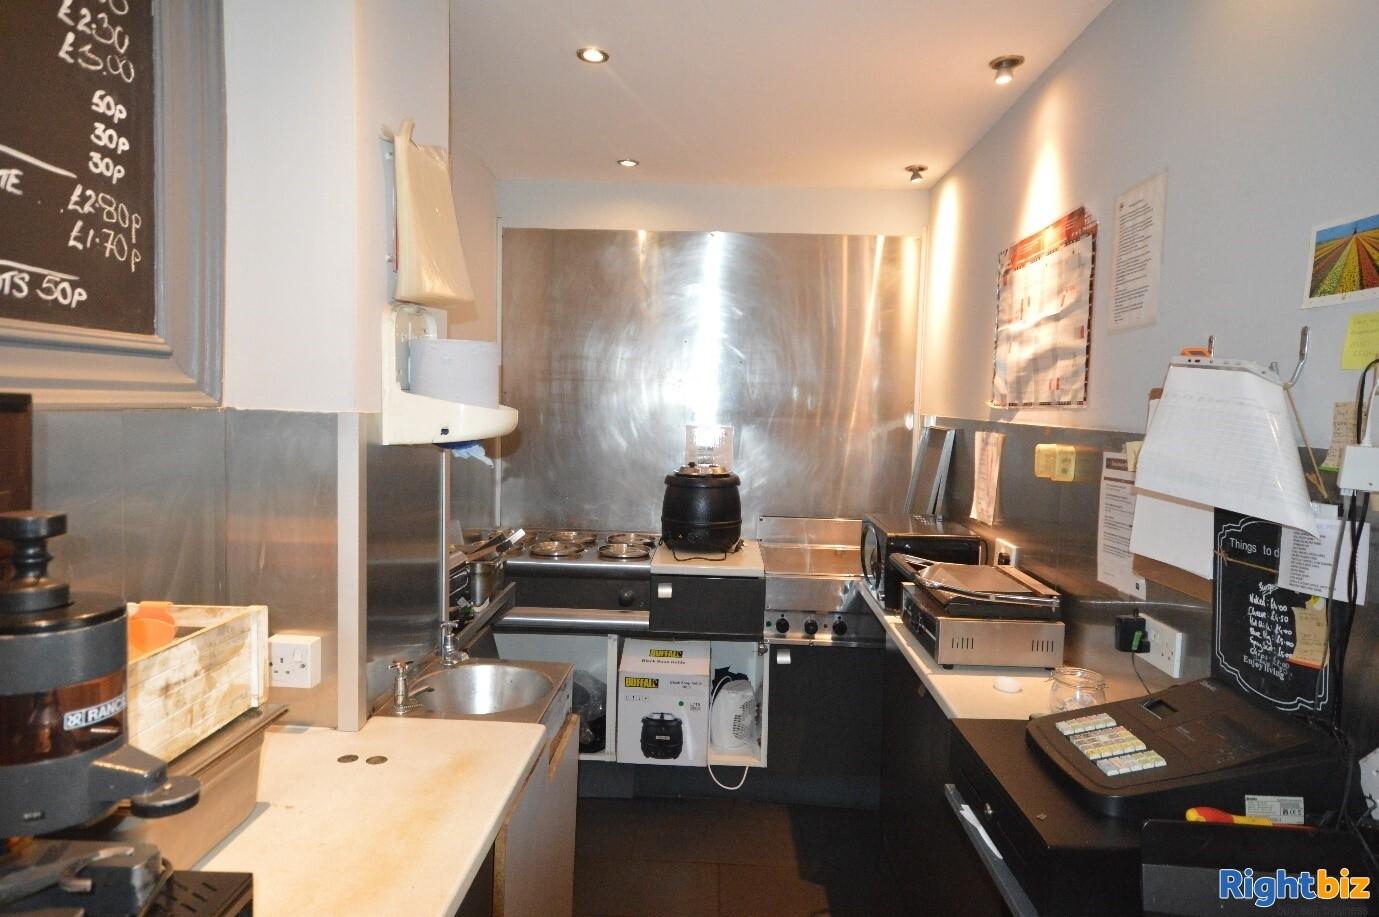 Full Class 3 hot food takeaway in Edinburgh city centre (ref 1396) - Image 6